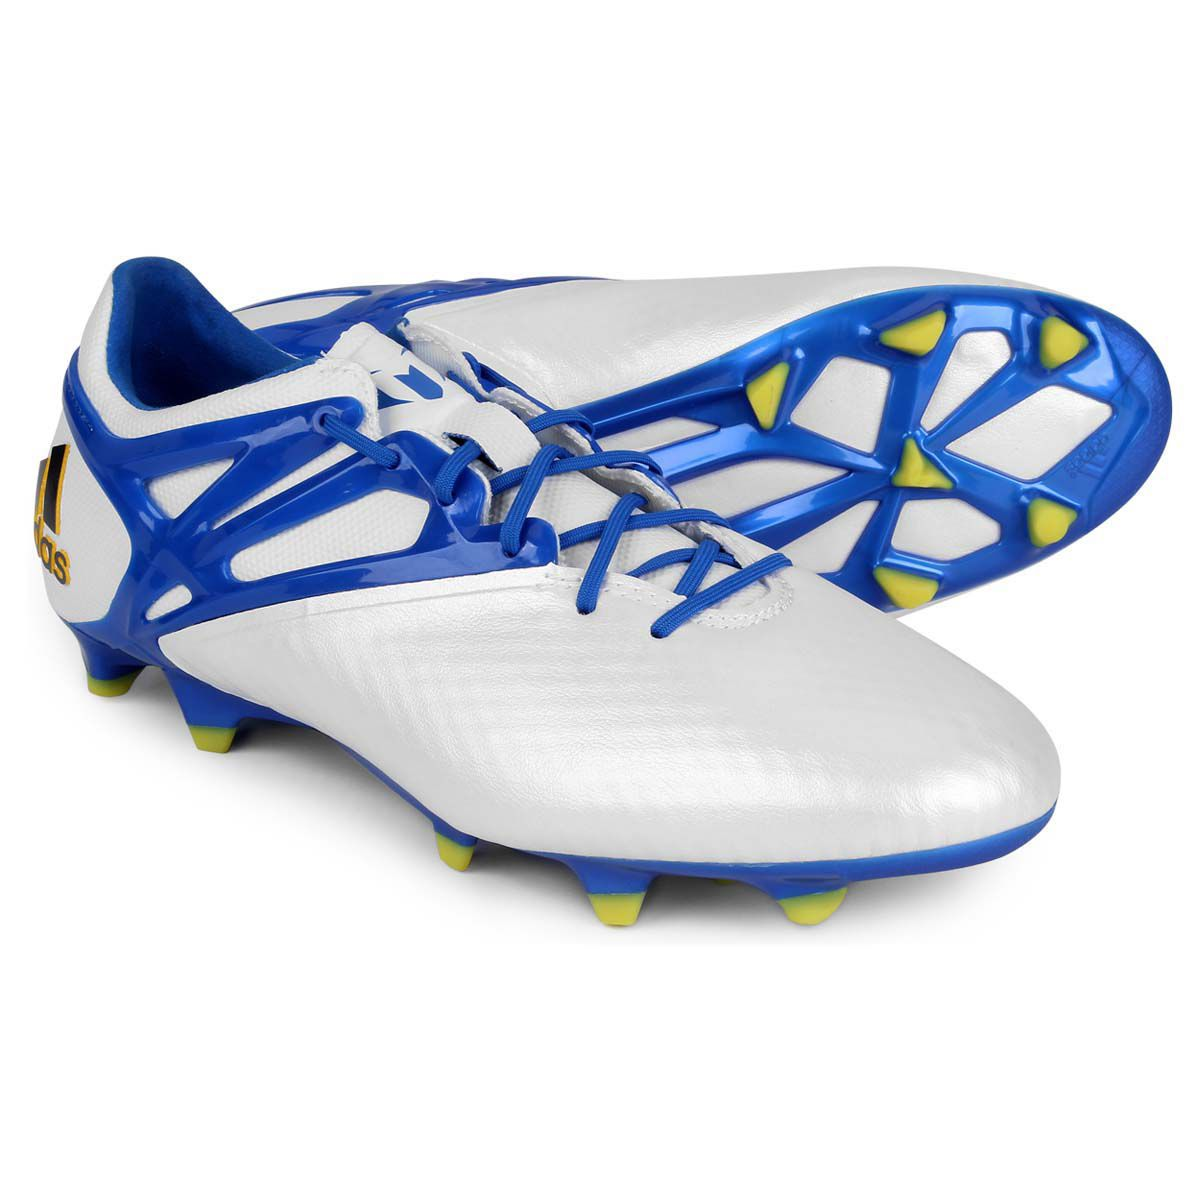 f66997518c5ef Chuteira Adidas Messi 15.1 FG AG Profissional